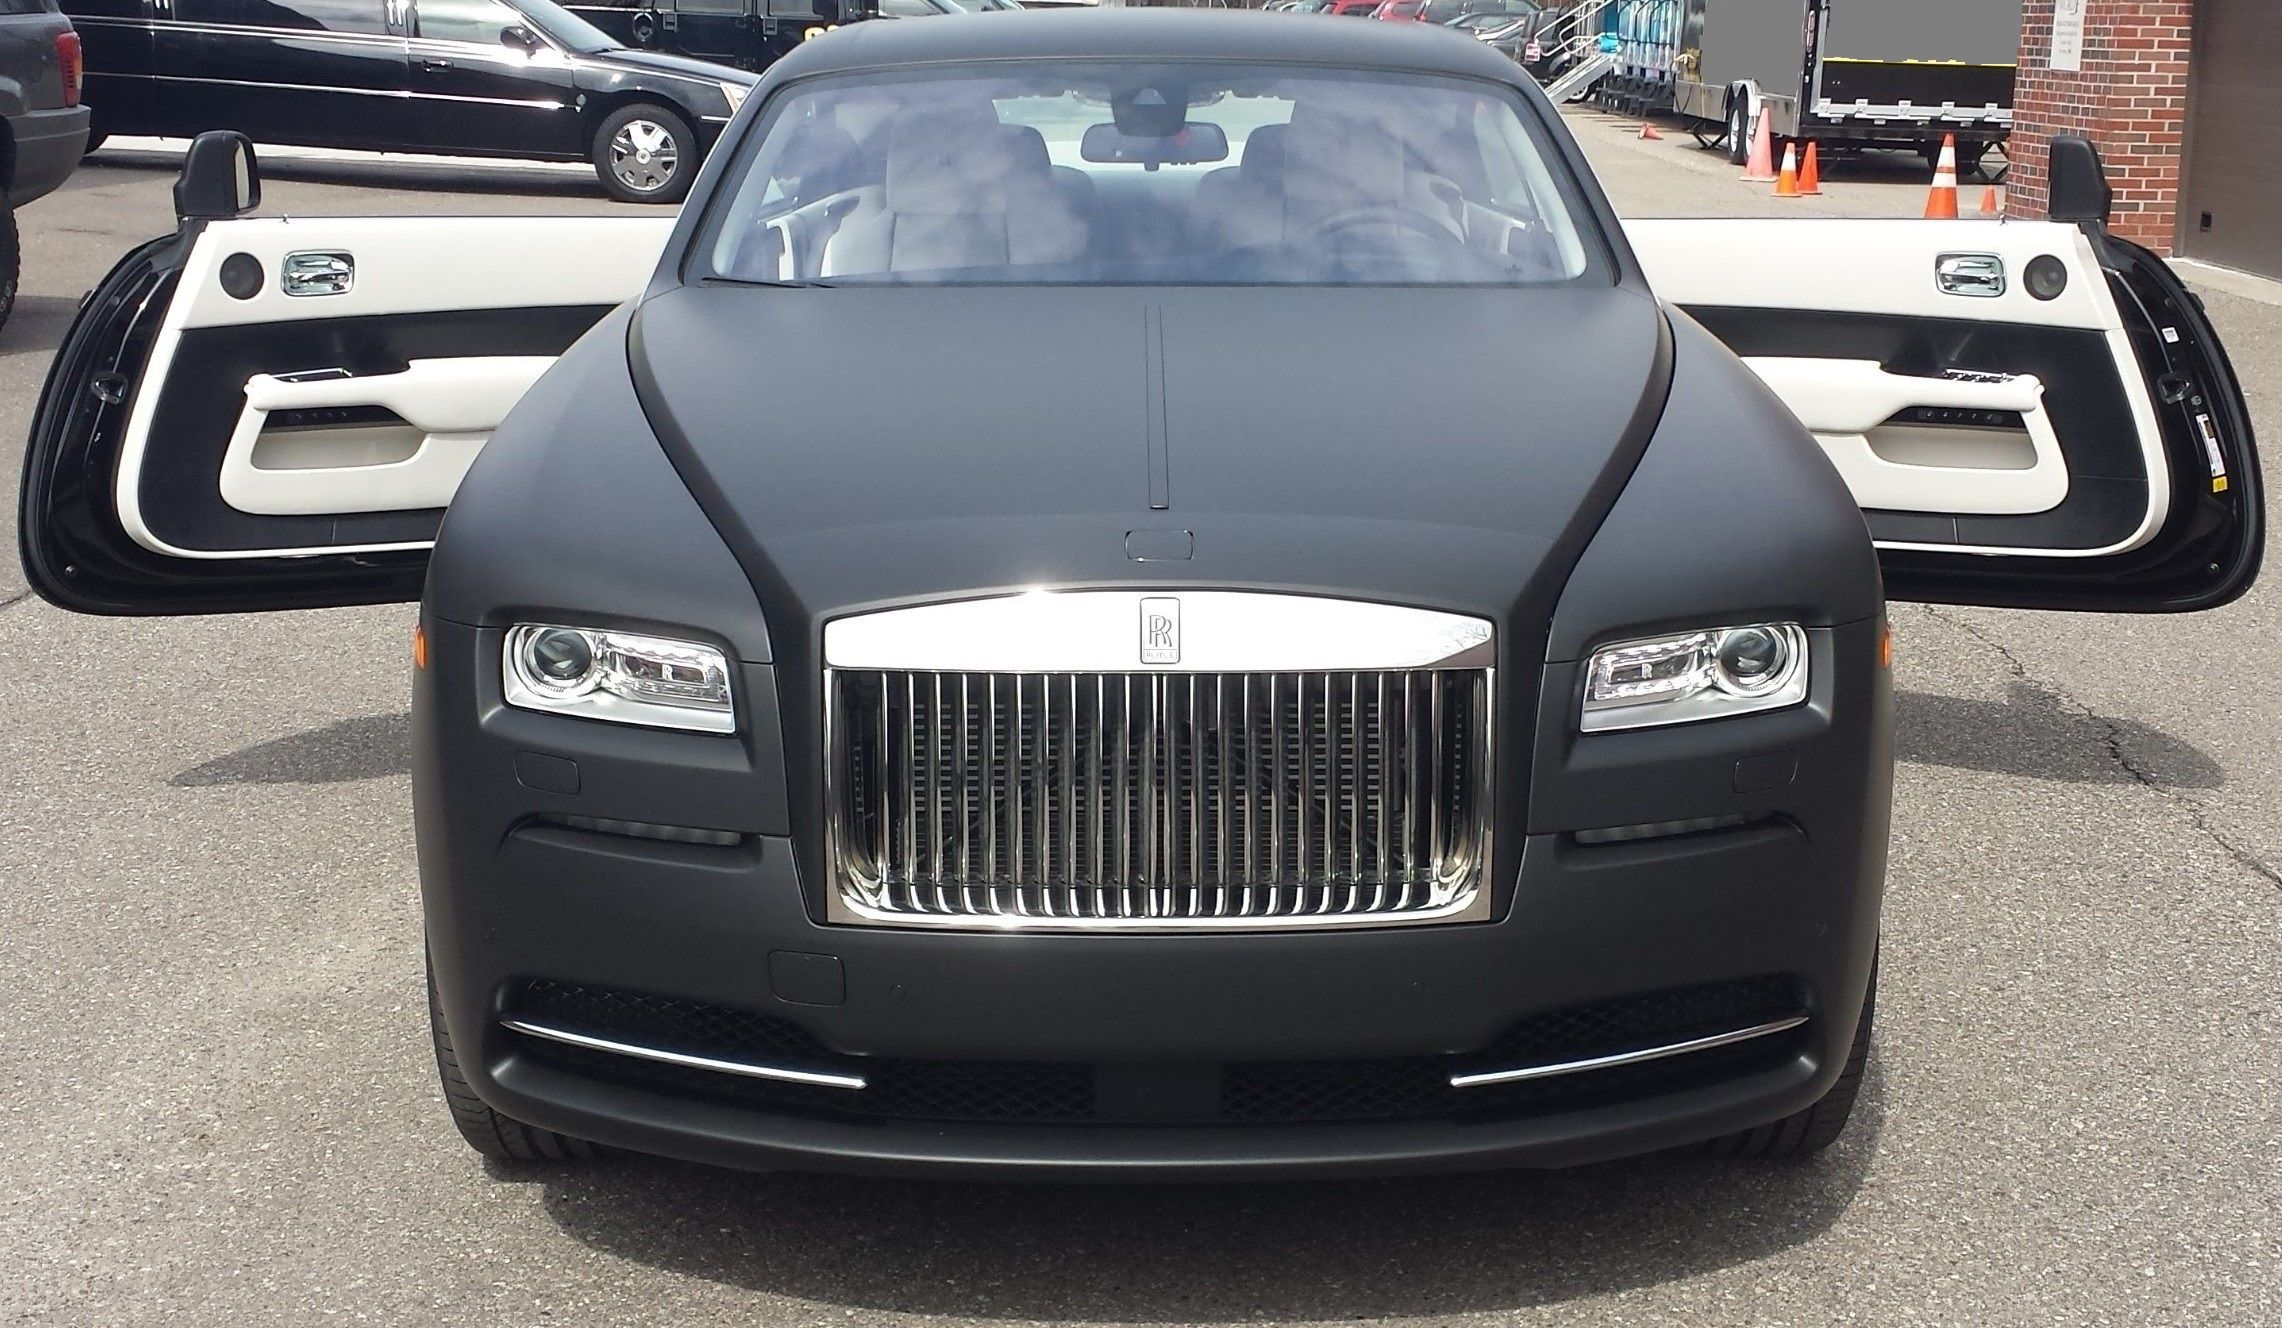 Rolls Royce Wraith Full Flat Black Wrap Rollsroyce Rollsroycewraith Flatblack Suicidedoors Rolls Royce Rolls Royce Wraith Rolls Royce Suv